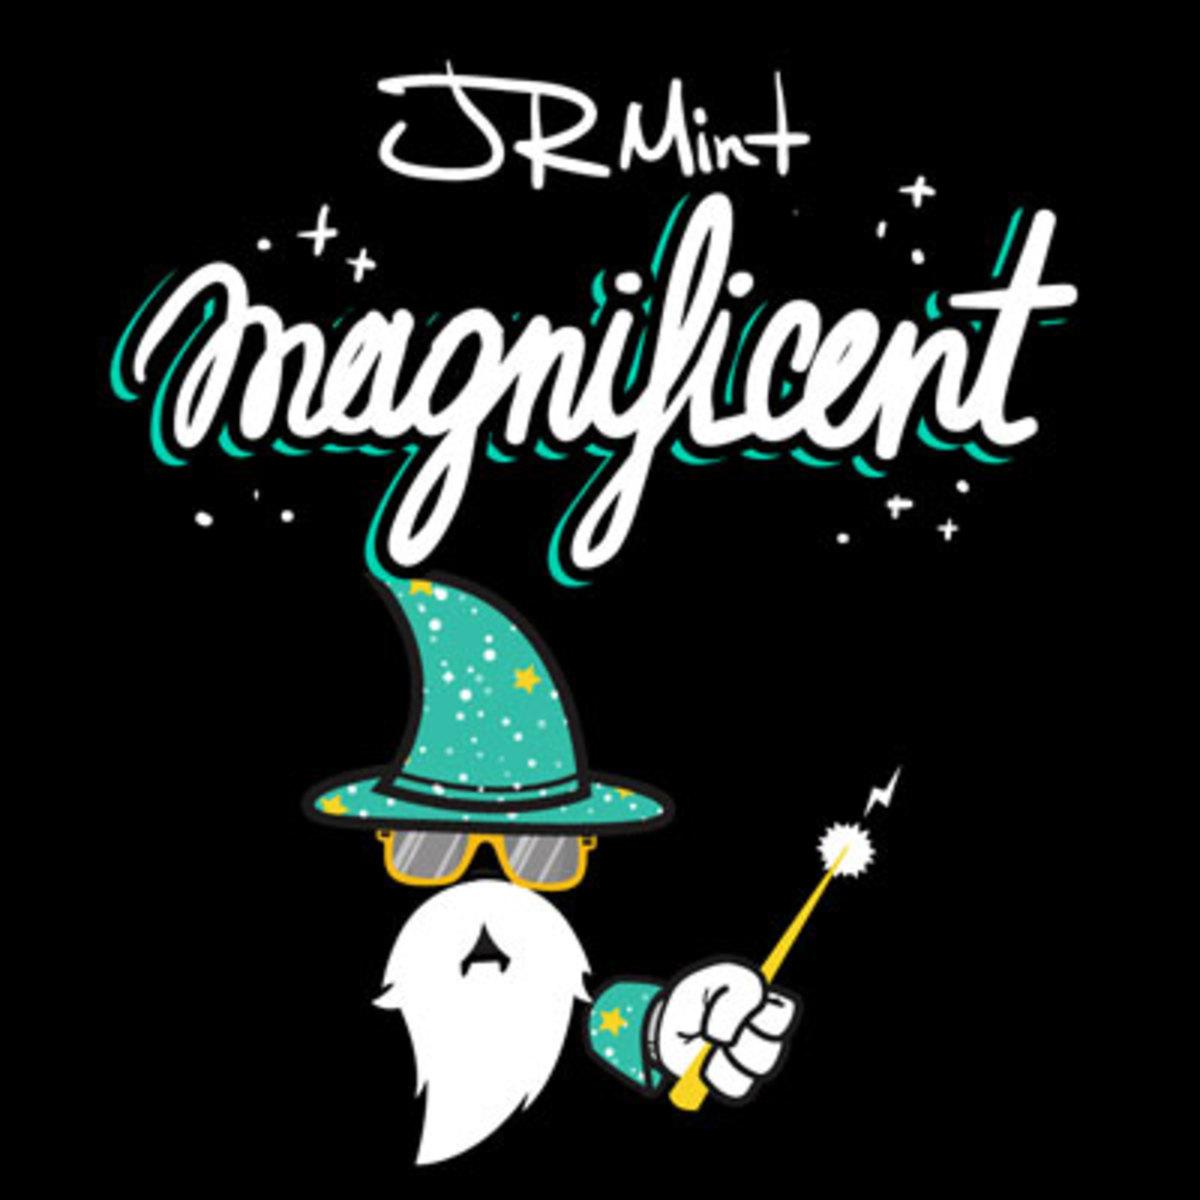 jrmint-magnificent.jpg